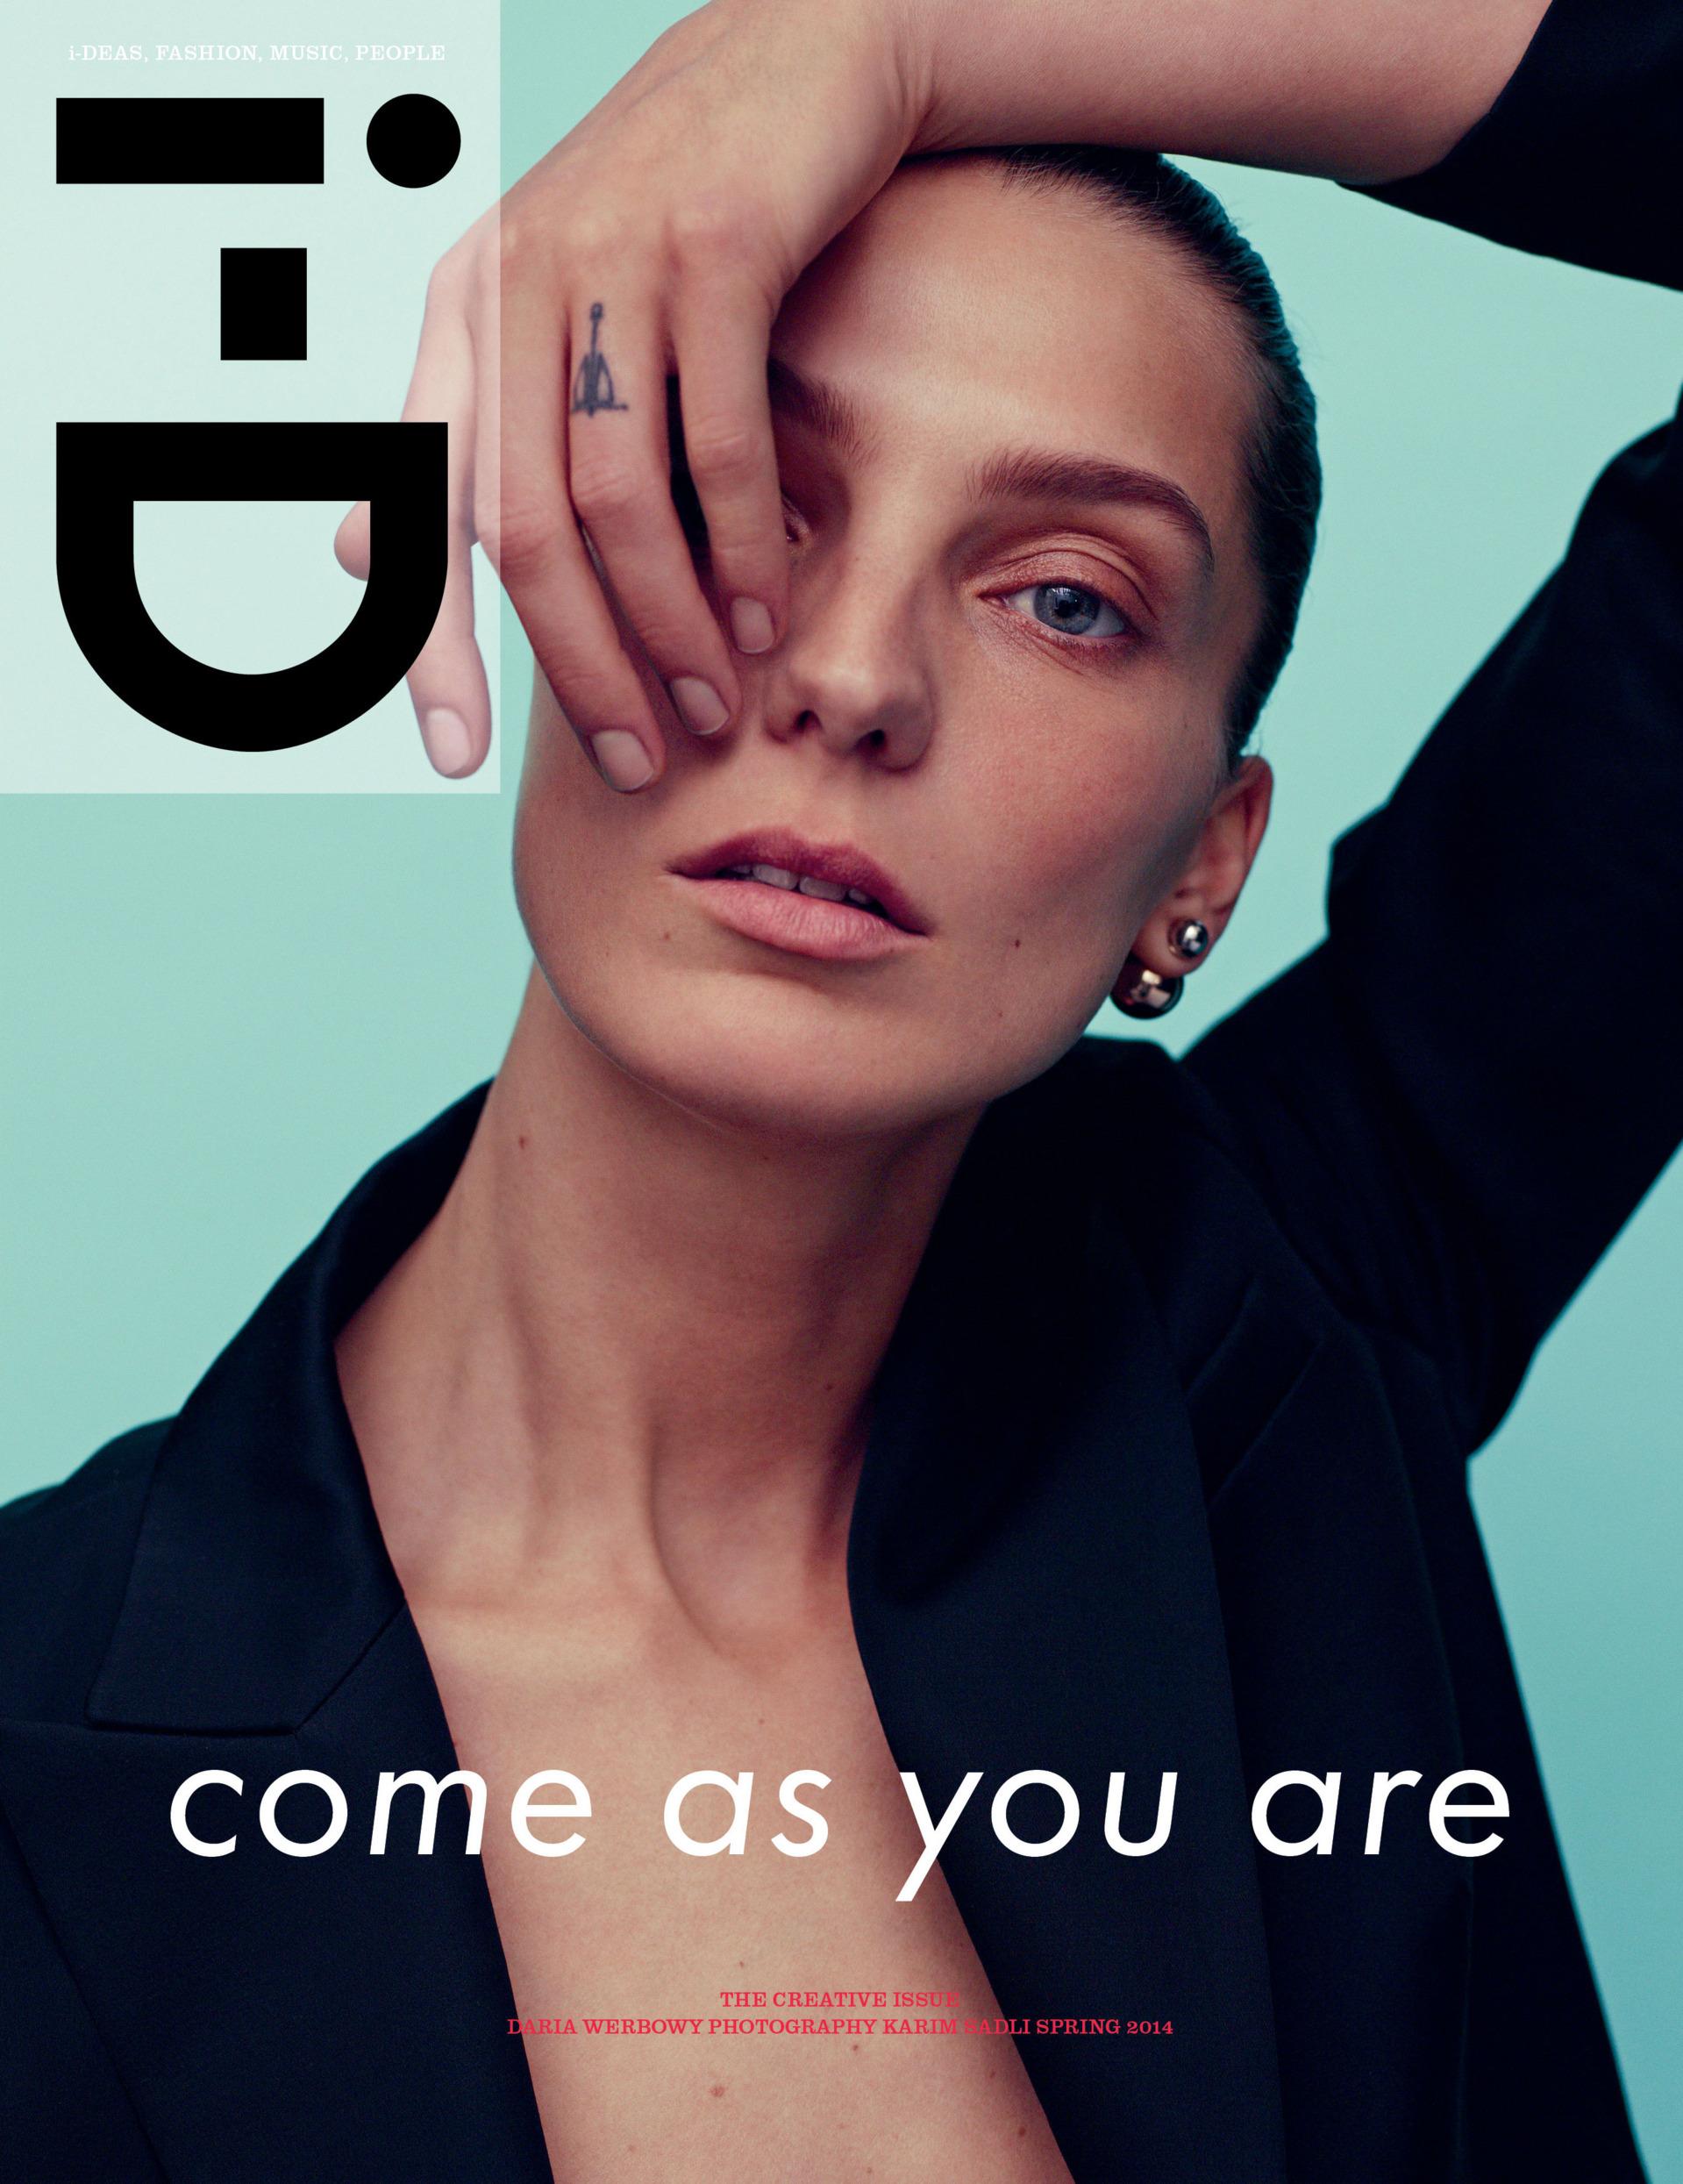 daria-werbowy-id-cover